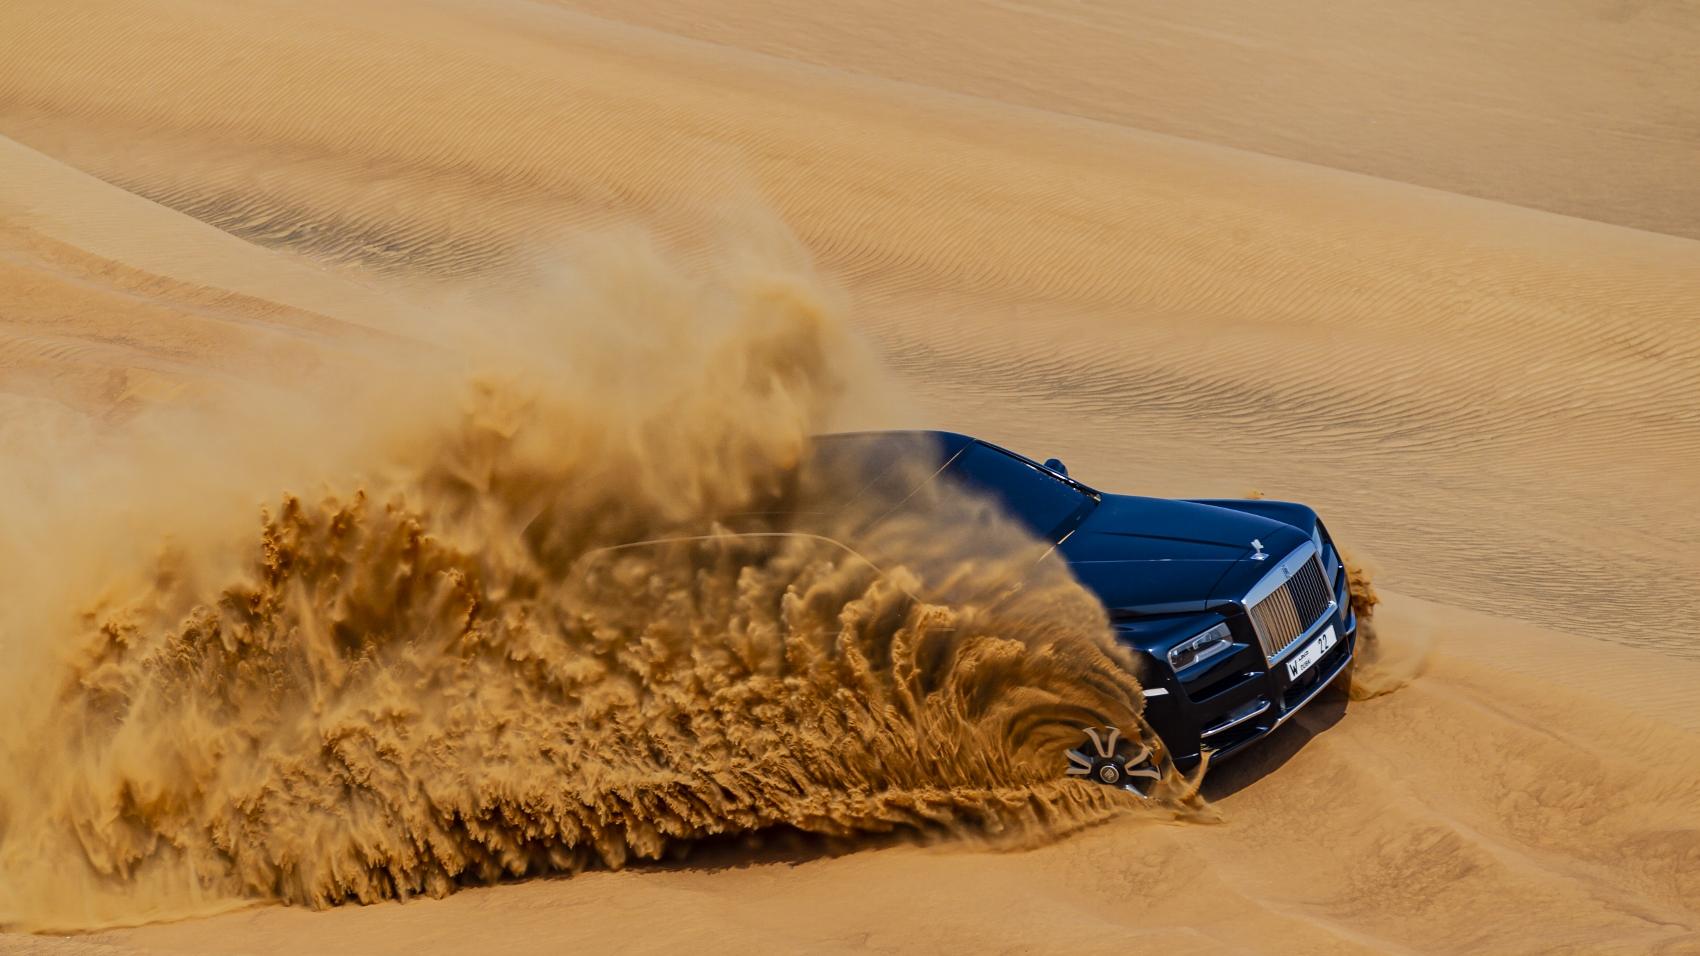 Rolls Royce Cullinan sa predviedol na púšti. Pozrite si foto aj video 8XXUdGifci rolls-royce-cullina